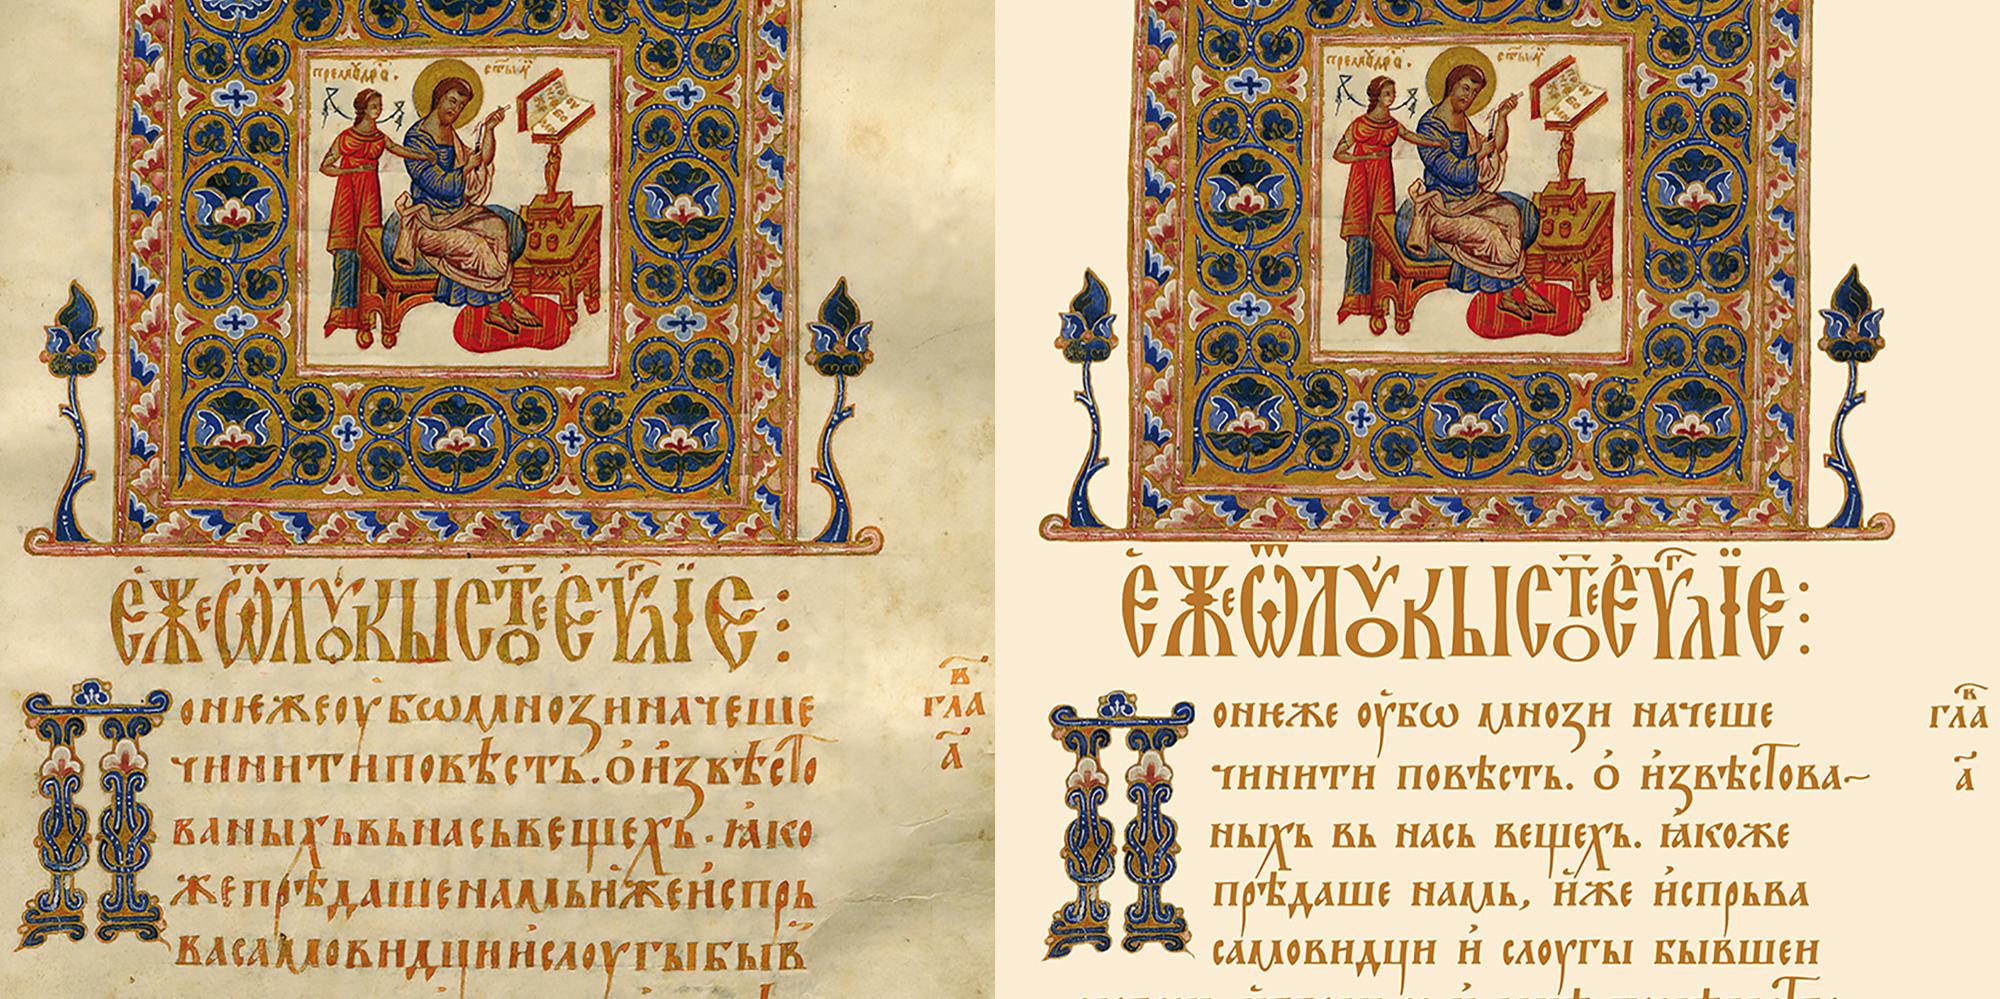 Left: A fourteenth century original manuscript of the Gospel of Luke, Monastery of Chilandar, Mount Athos. Right: Zorans digitization of the calligraphy seen in the manuscript